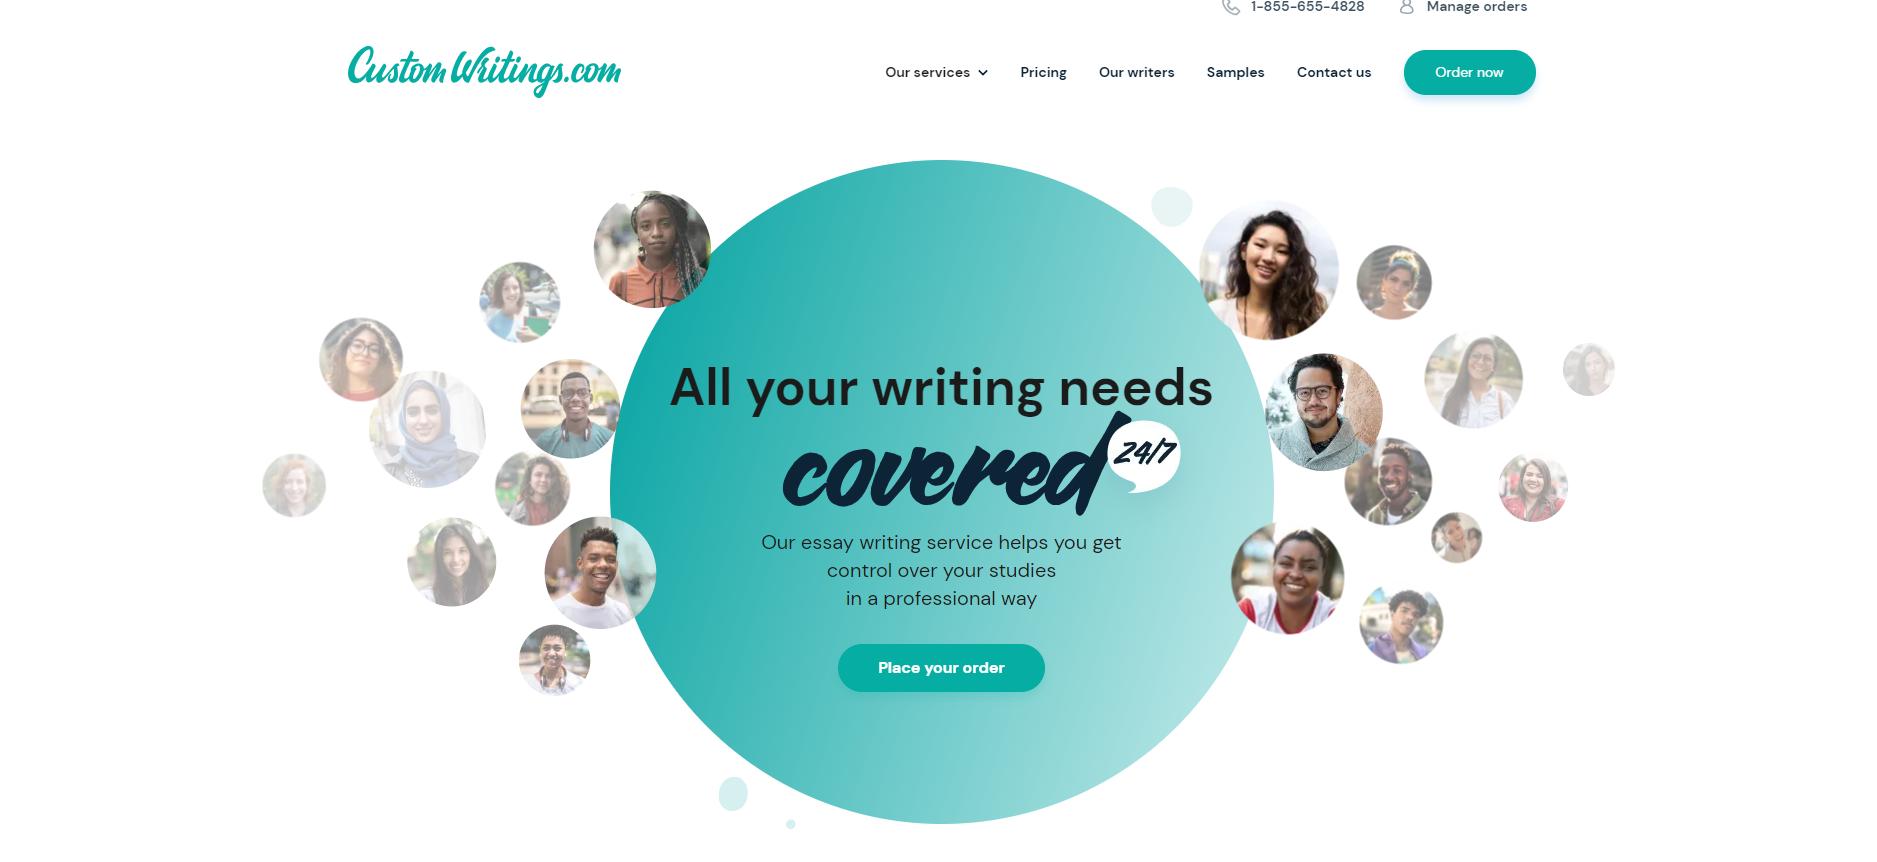 customwritings-website